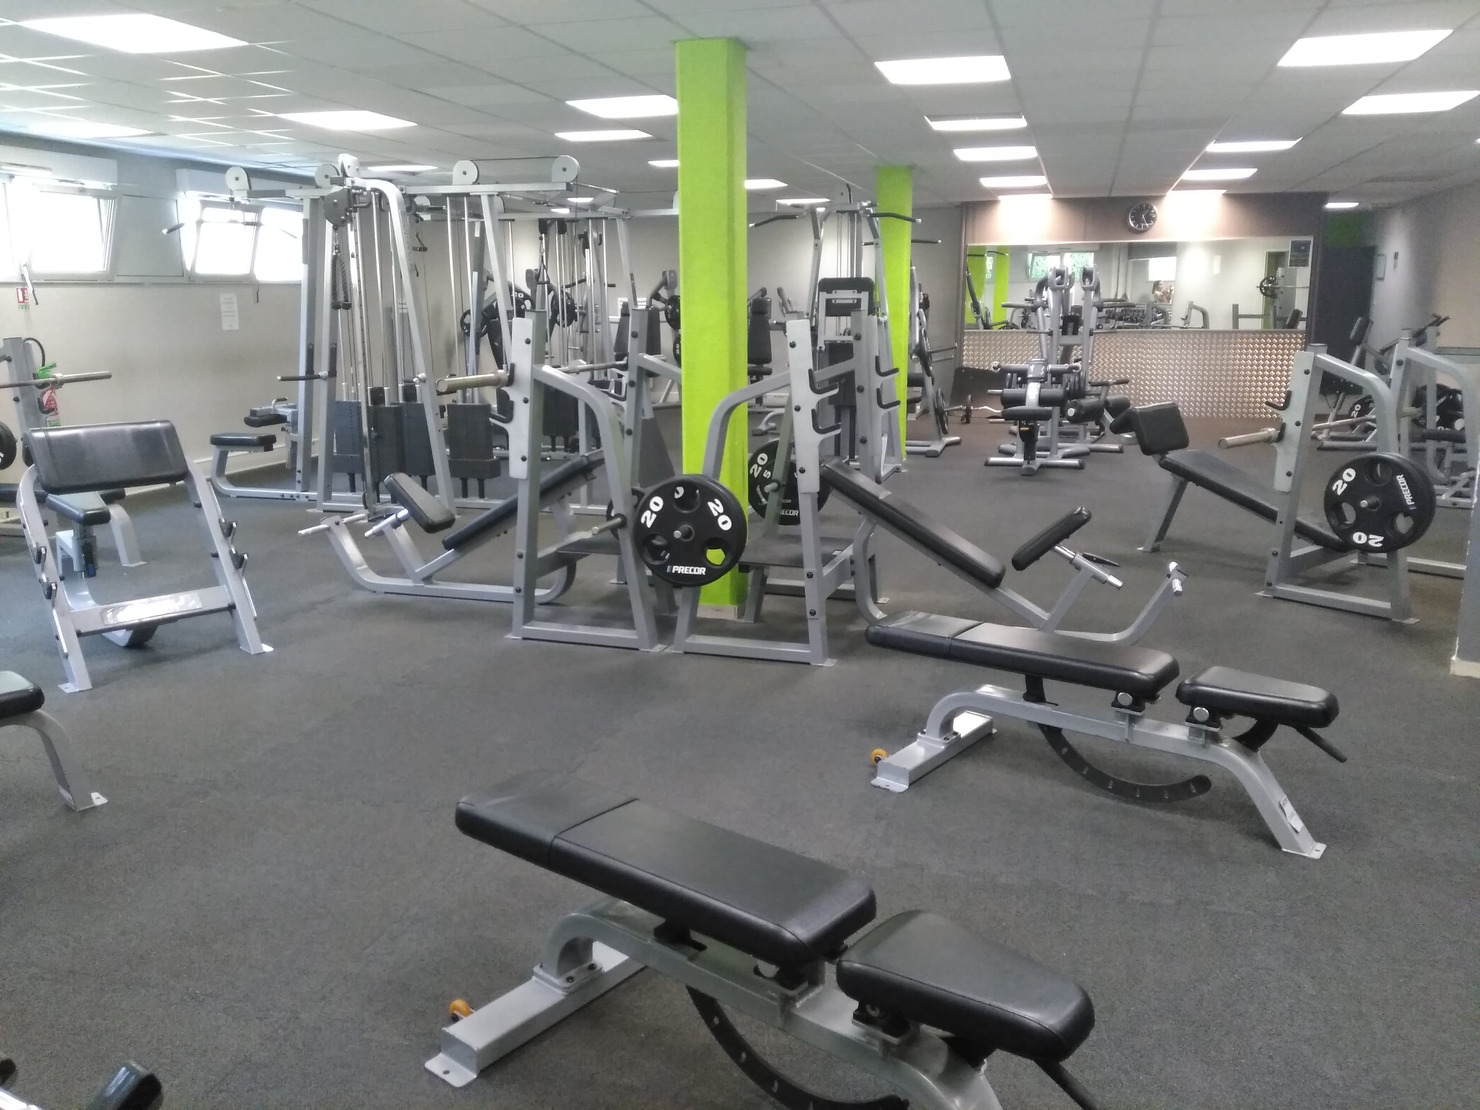 liberty gym dijon tarifs avis horaires essai gratuit. Black Bedroom Furniture Sets. Home Design Ideas